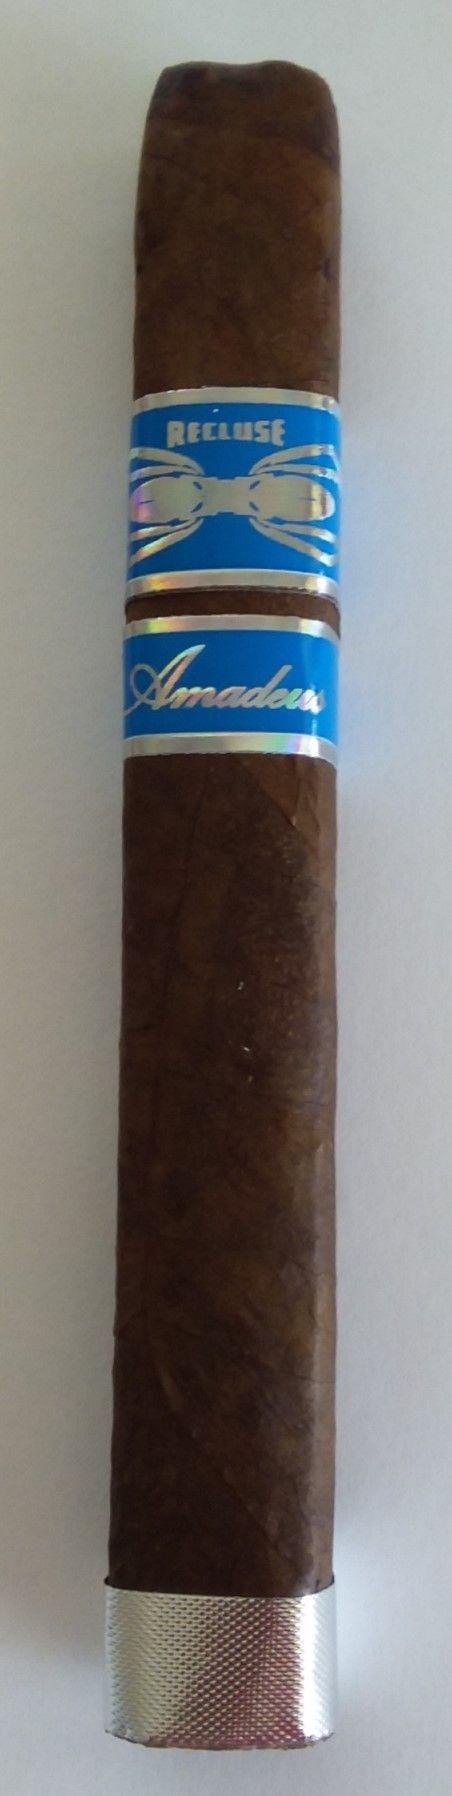 Recluse Amadeus Cigar